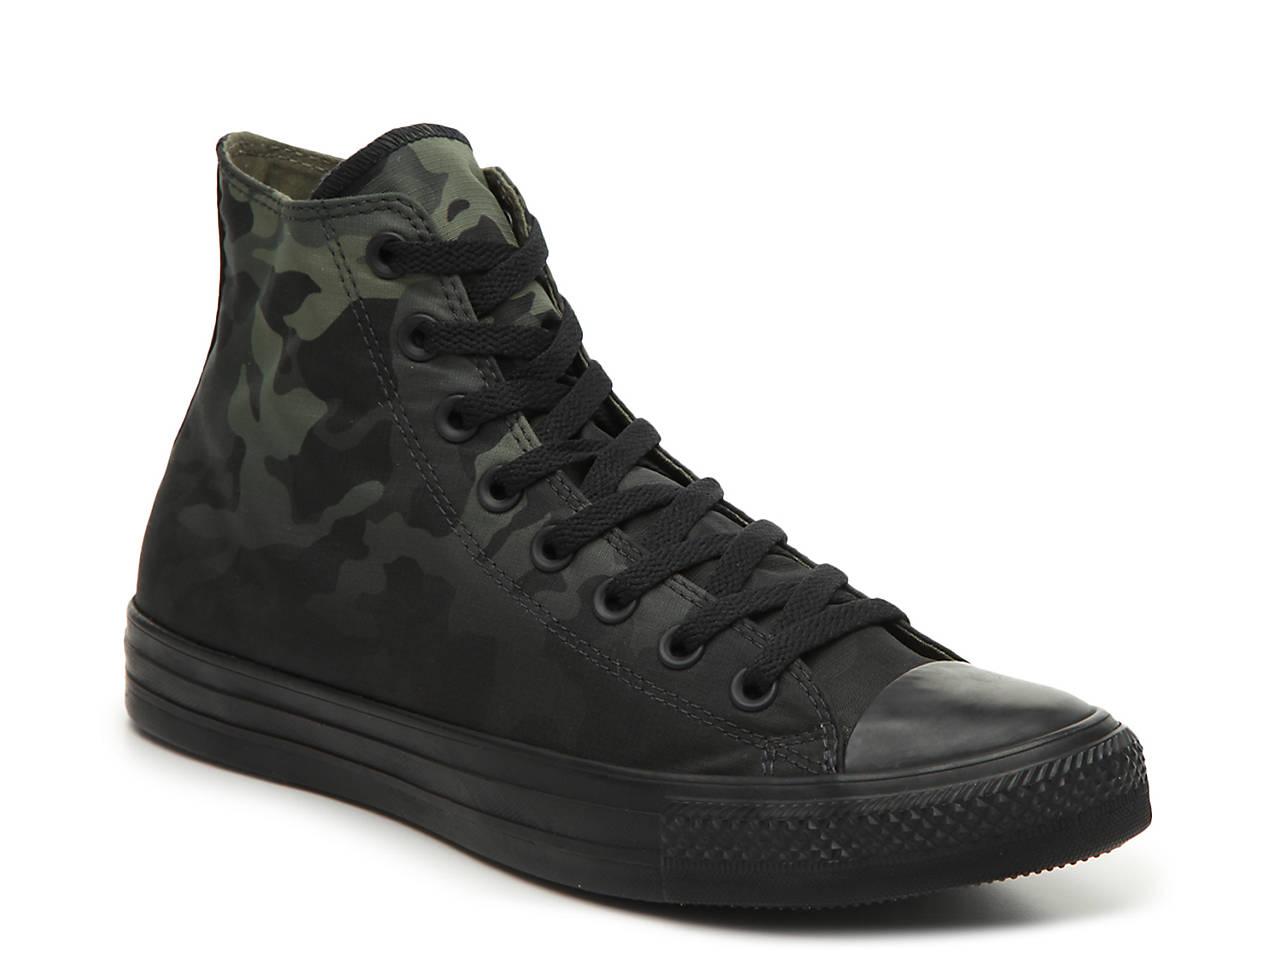 0fedefcabe1d Converse Chuck Taylor All Star Hi Camo High-Top Sneaker - Women s ...